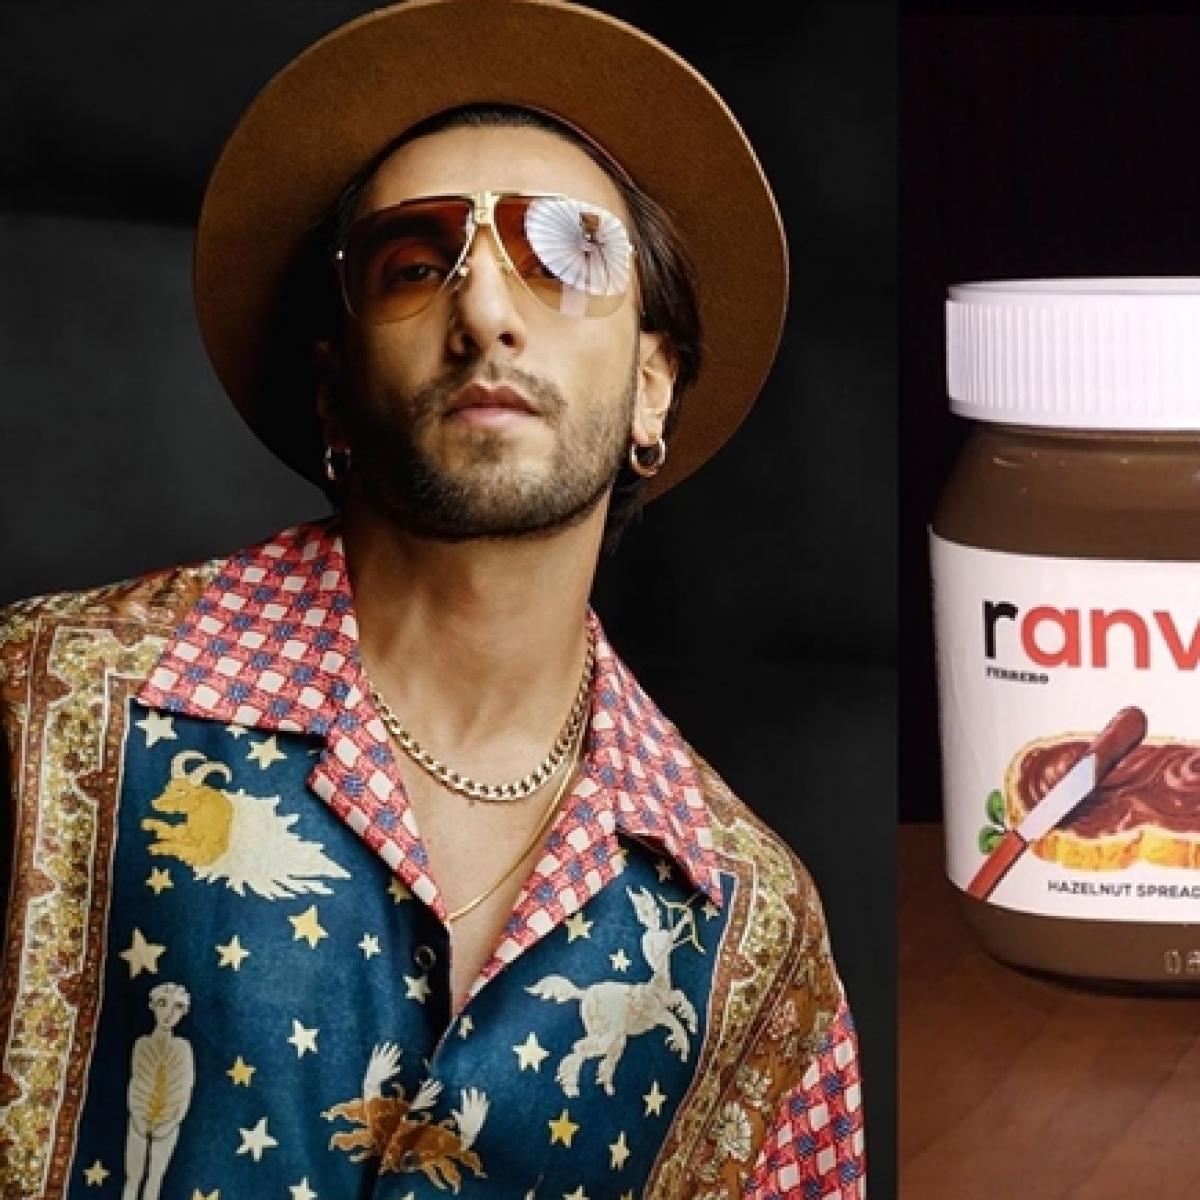 'Khao piyo, masst raho': Ranveer Singh shares self quarantine message with Nutella jars named after him!